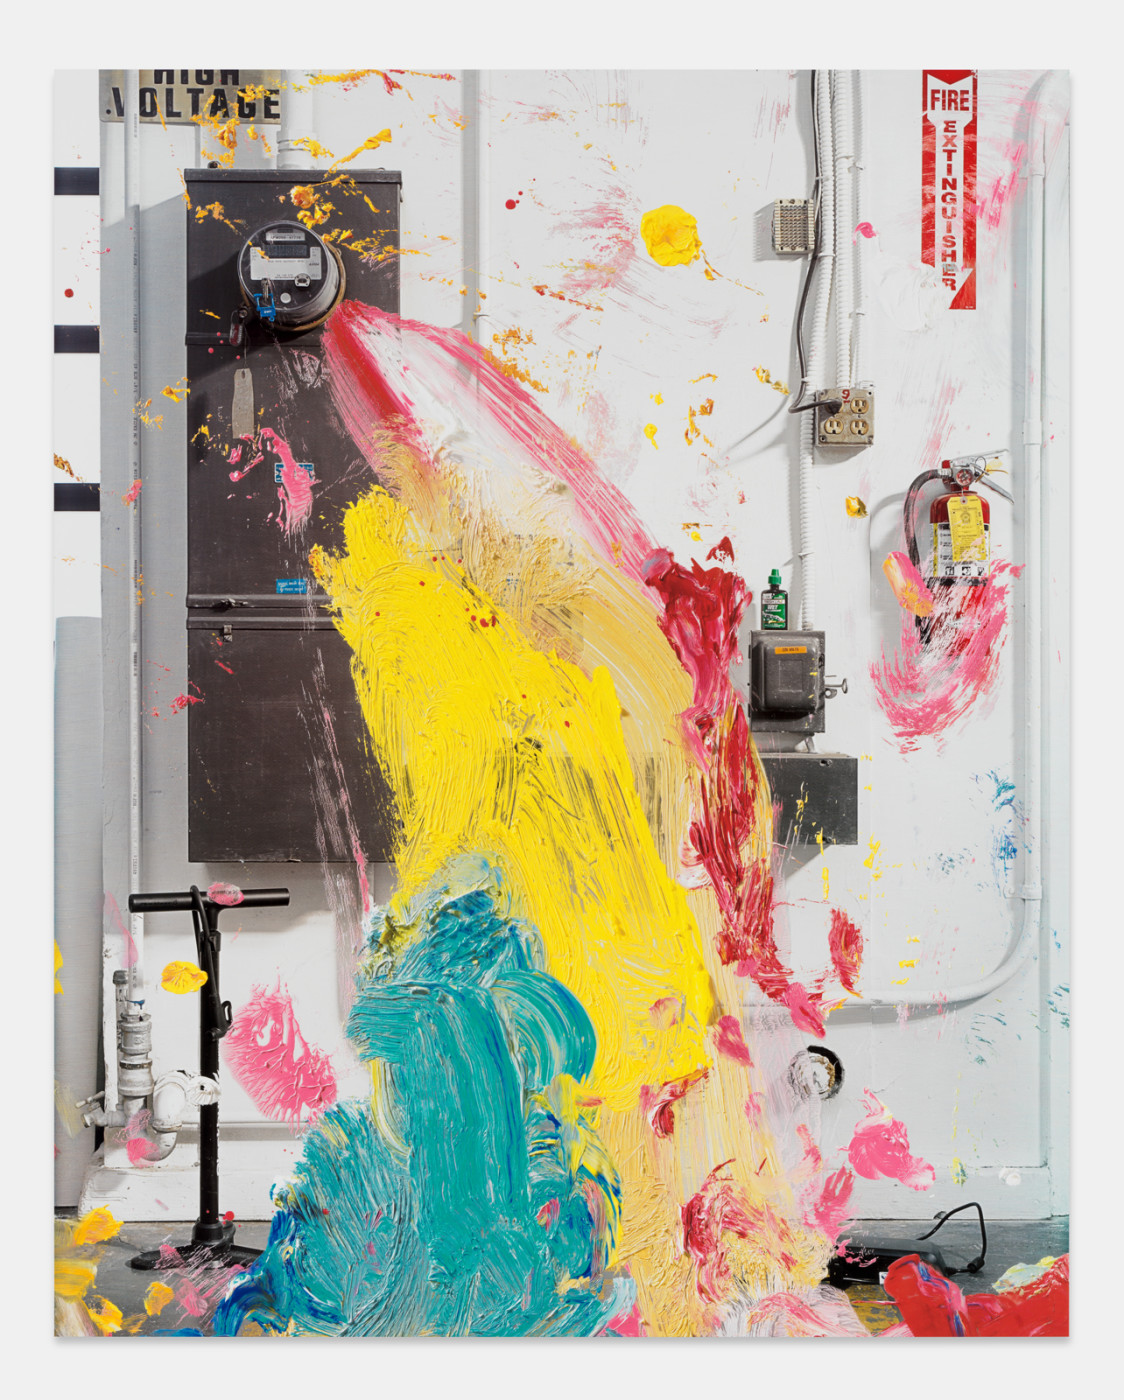 "<div class=""artwork_caption""><div class=""title""><em>High Voltage</em>, 2021<div class=""medium"">aluminium composite panel, aluminium honeycomb, polyurethane adhesive, epoxy primer, gesso, solvent-based screen printing paint, water-based screen printing paint</div><div class=""dimensions"">site size: 243.8 x 194.9 x 2.2 cm / 96 x 76 ¾ x ⅞ in<br />frame size: 247.6 x 198.7 x 5.1 cm / 97 ½ x 78 ¼ x 2 ⅛ in</div></div></div><div class=""link""><span class=""website_contact_form"" data-contact-form-details=""High Voltage, 2021aluminium composite panel, aluminium honeycomb, polyurethane adhesive, epoxy primer, gesso, solvent-based screen printing paint, water-based screen printing paint  site size: 243.8 x 194.9 x 2.2 cm / 96 x 76 ¾ x ⅞ in frame size: 247.6 x 198.7 x 5.1 cm / 97 ½ x 78 ¼ x 2 ⅛ in"" data-contact-form-image=""https://artlogic-res.cloudinary.com/w_200,h_200,c_fill,f_auto,fl_lossy/ws-sadiecoles/usr/exhibitions/images/exhibitions/859/hq24-uf17310p_uf21002_high_voltage_b_rt_canonical.jpeg"">Enquire</span></div>"